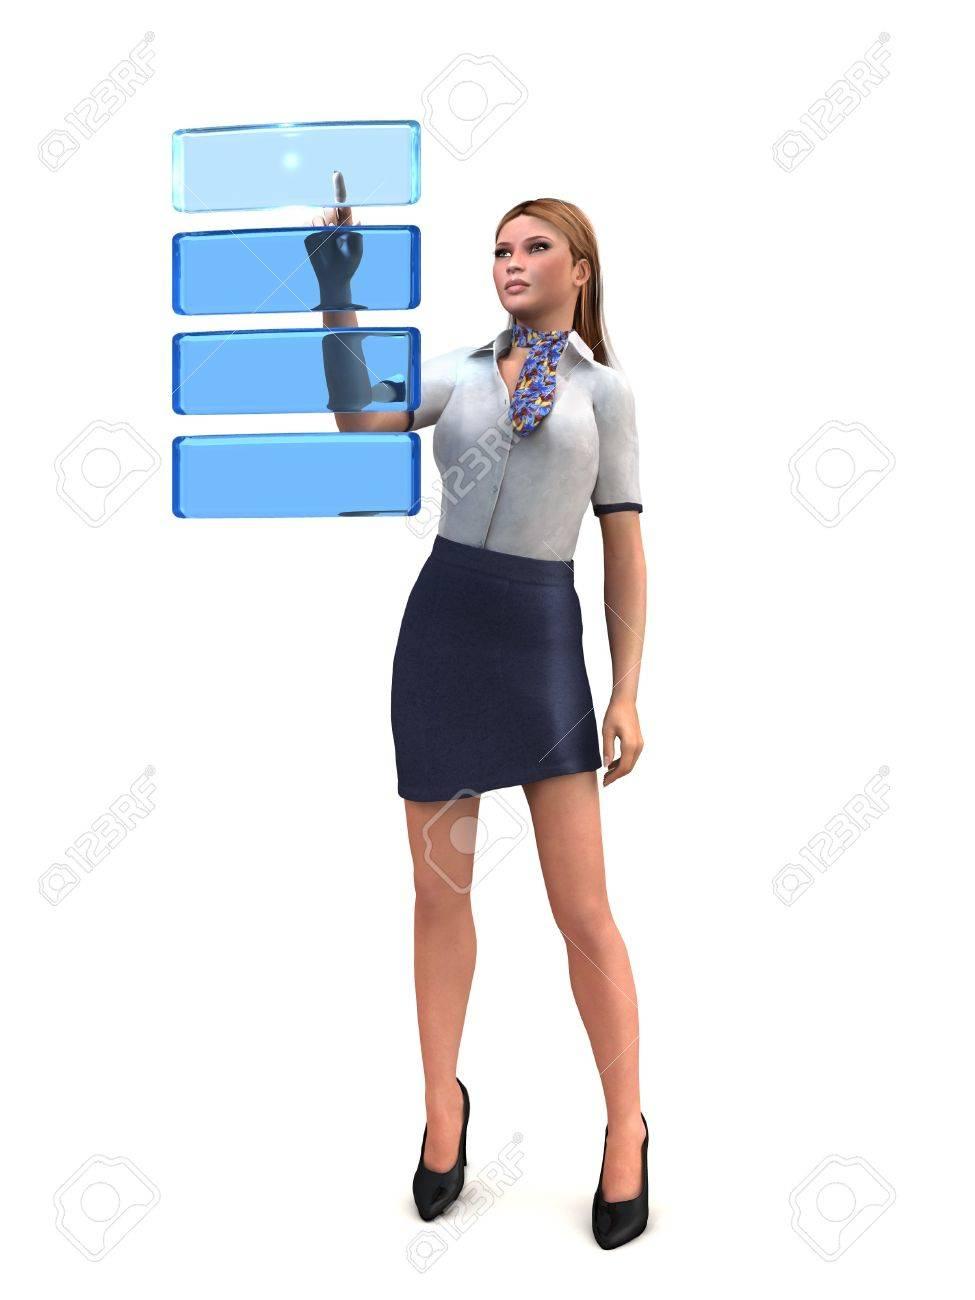 woman chooses a virtual menu Stock Photo - 13697246